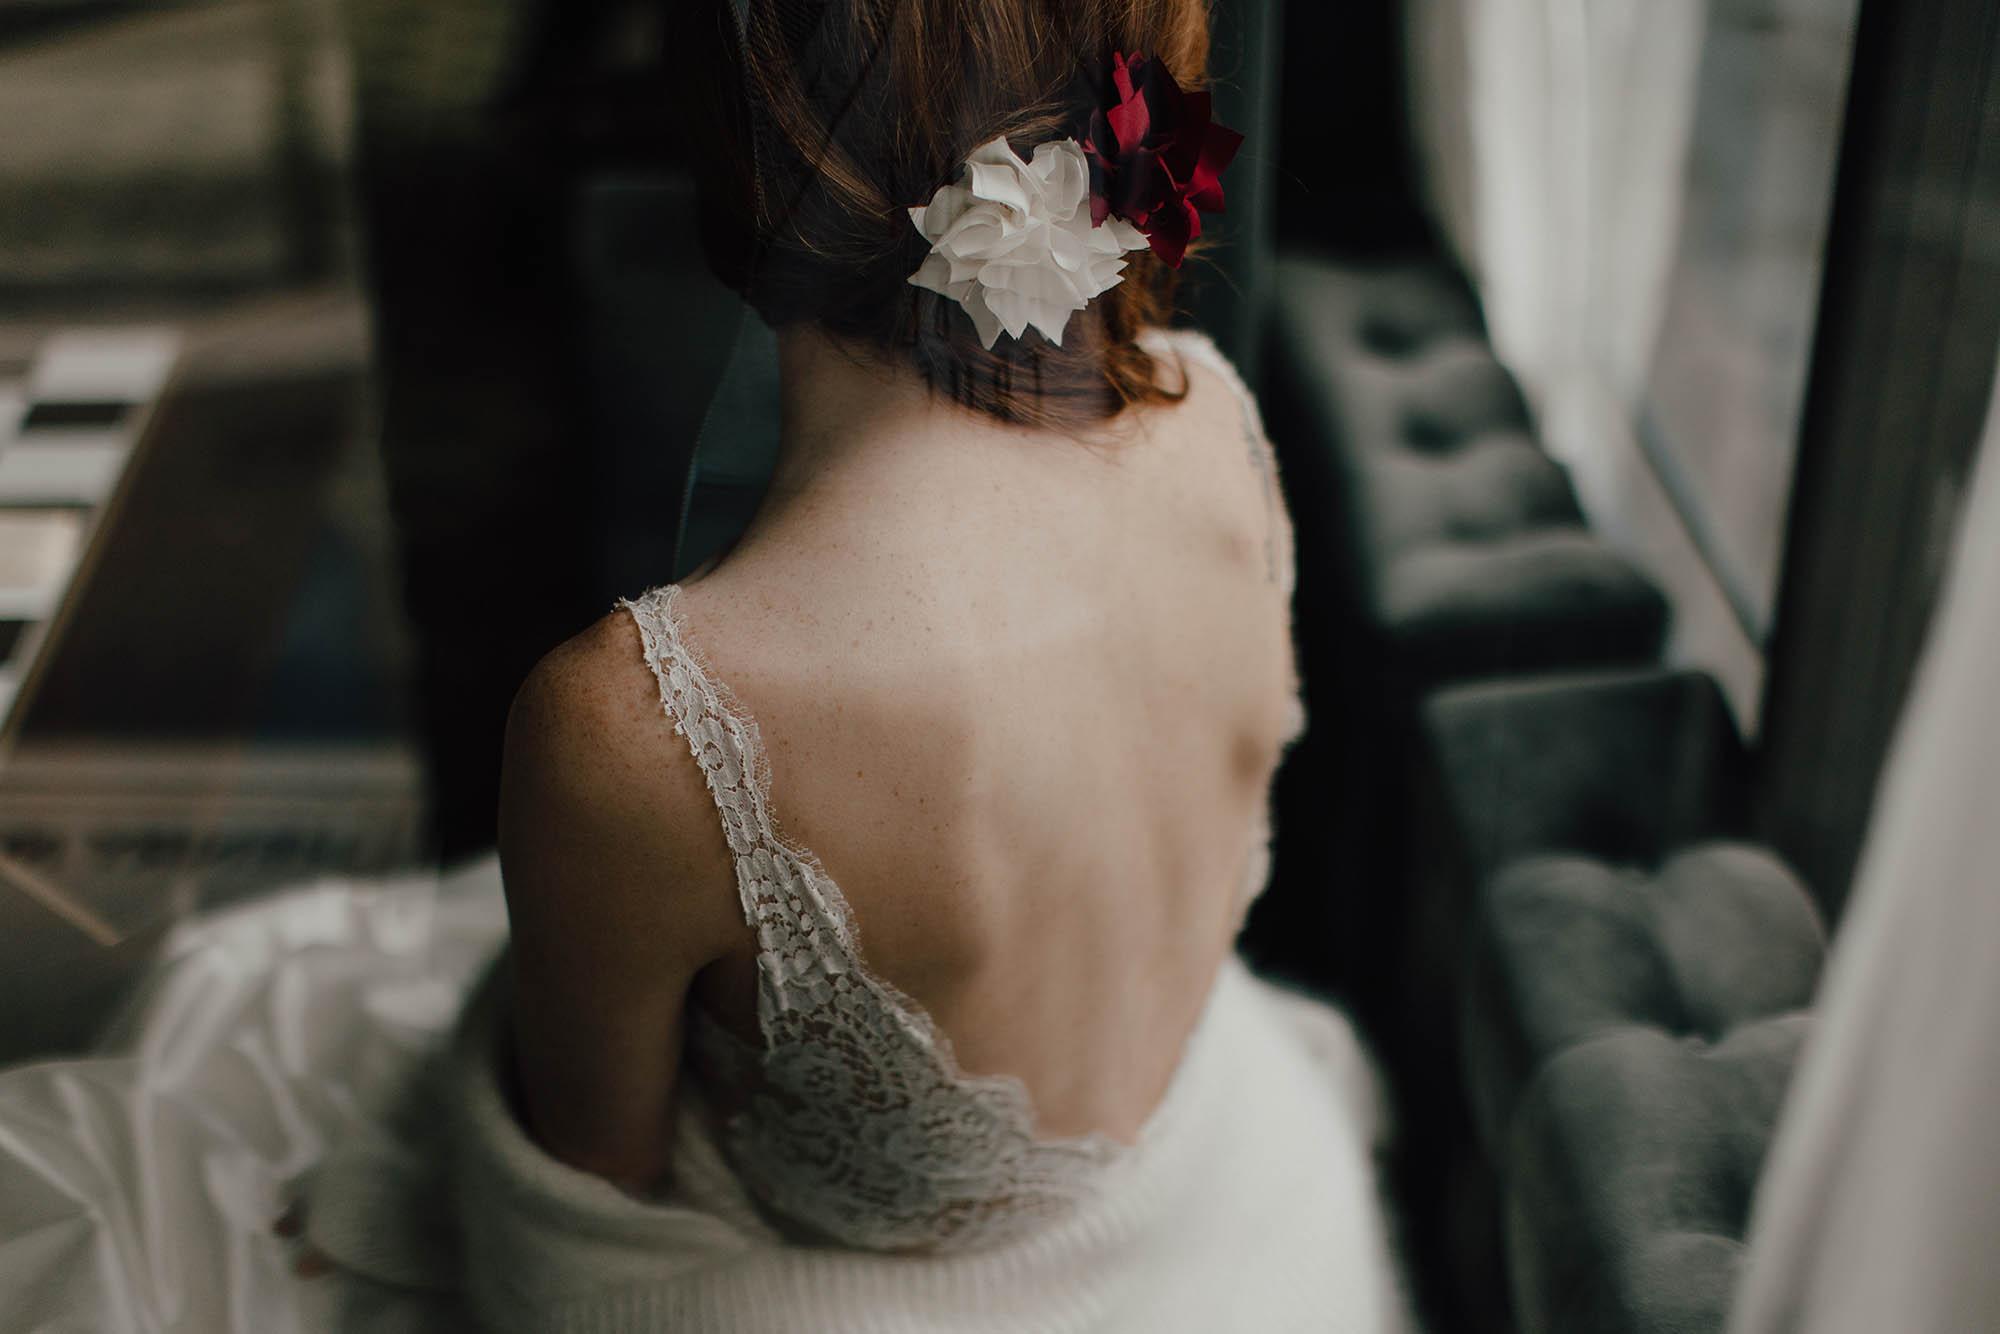 youmademydayphotography-destination-wedding-photographer-david-purves-boheme-rock-paris-web-81